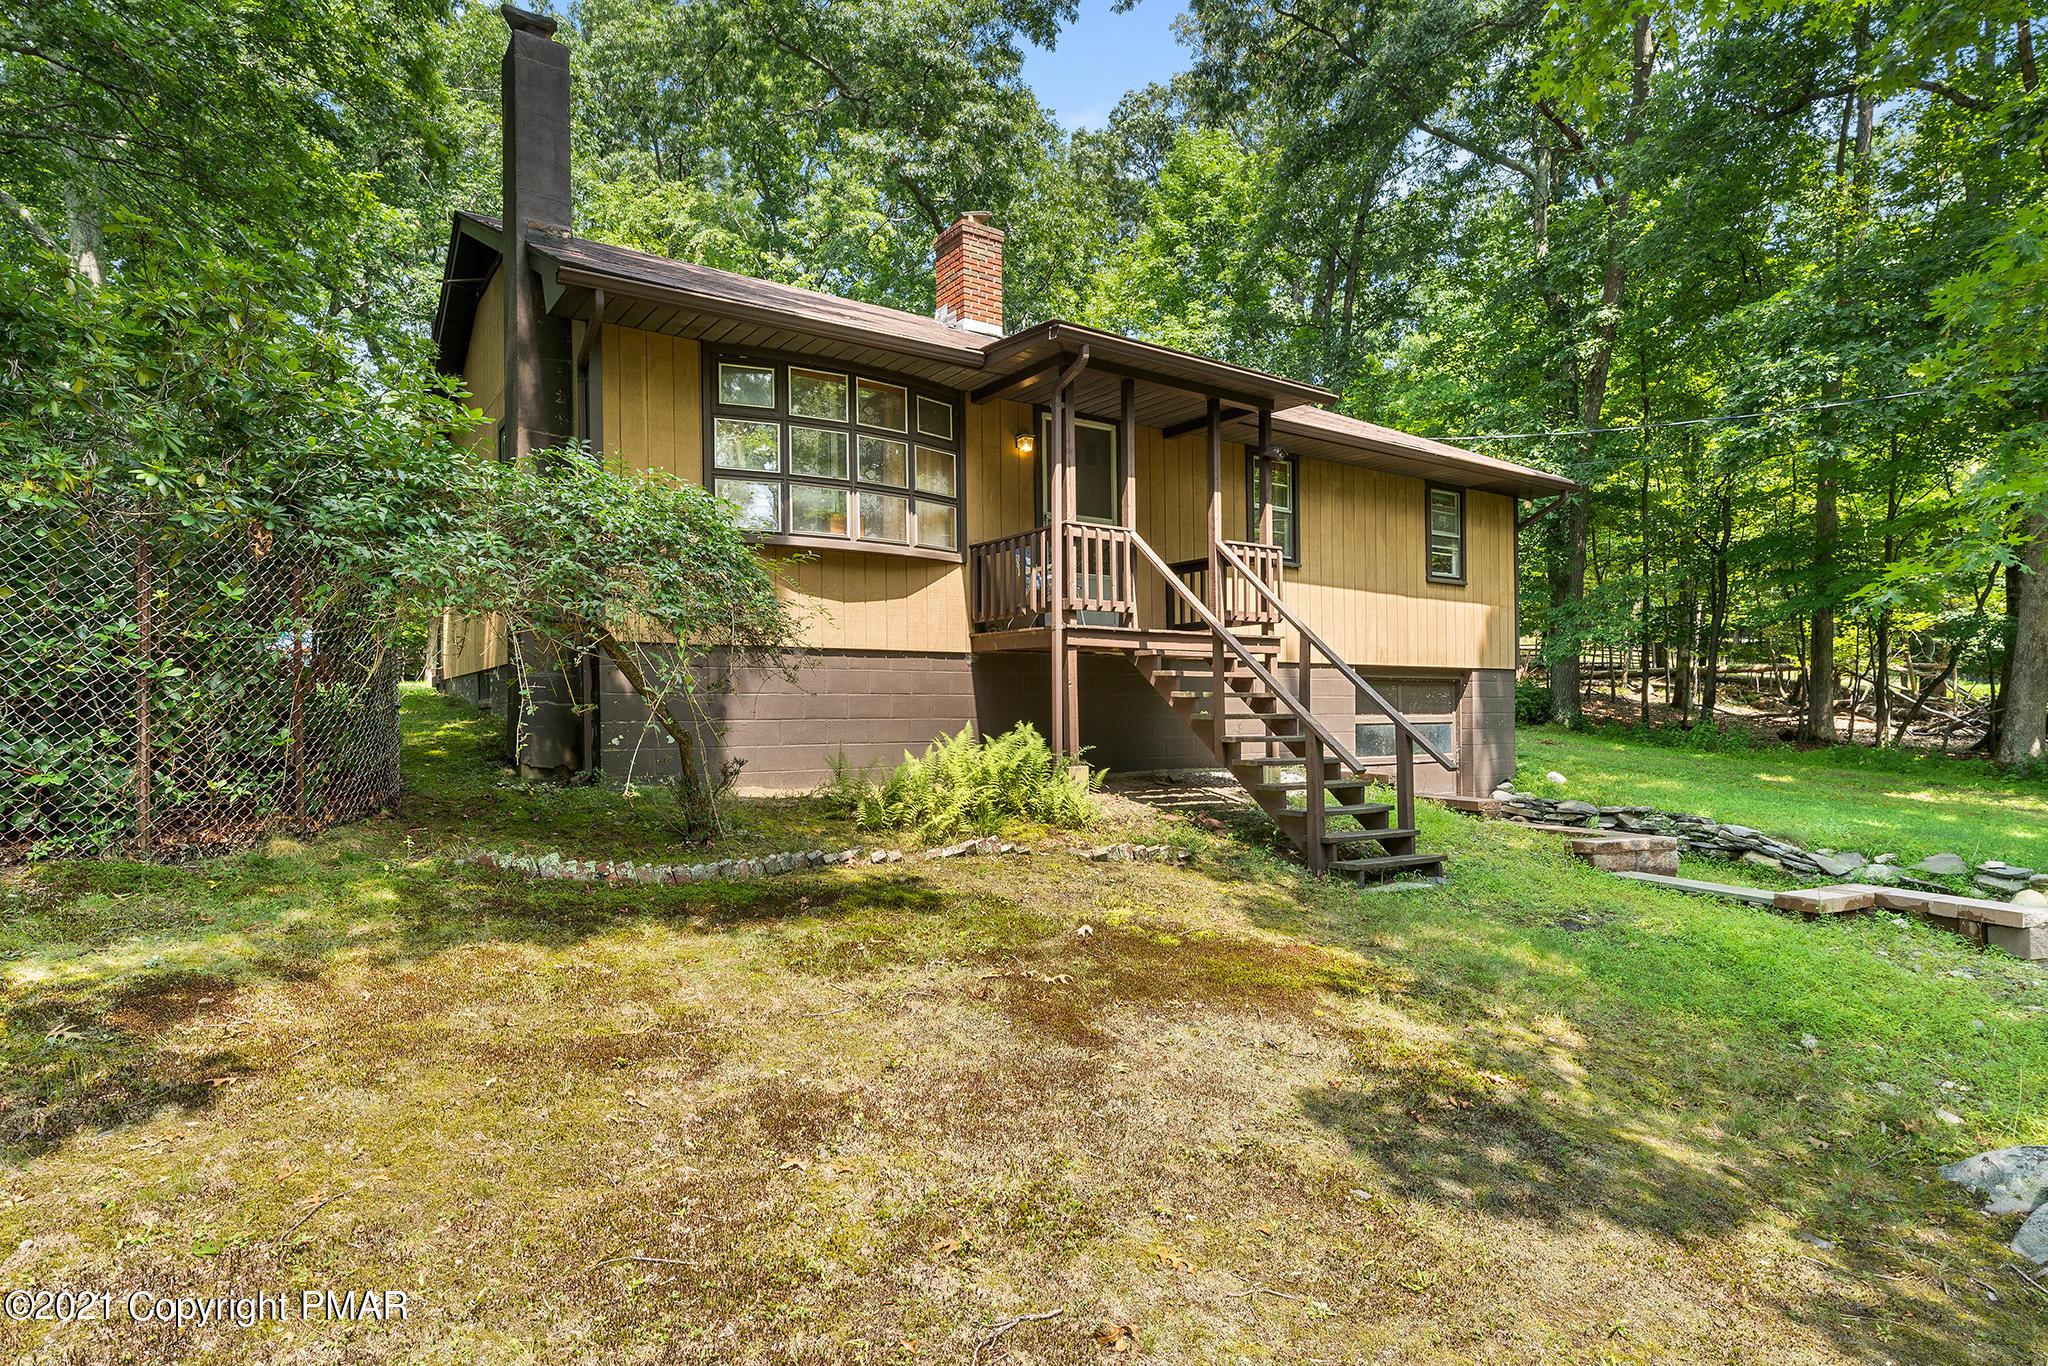 617 George Pl, Bushkill, PA 18324